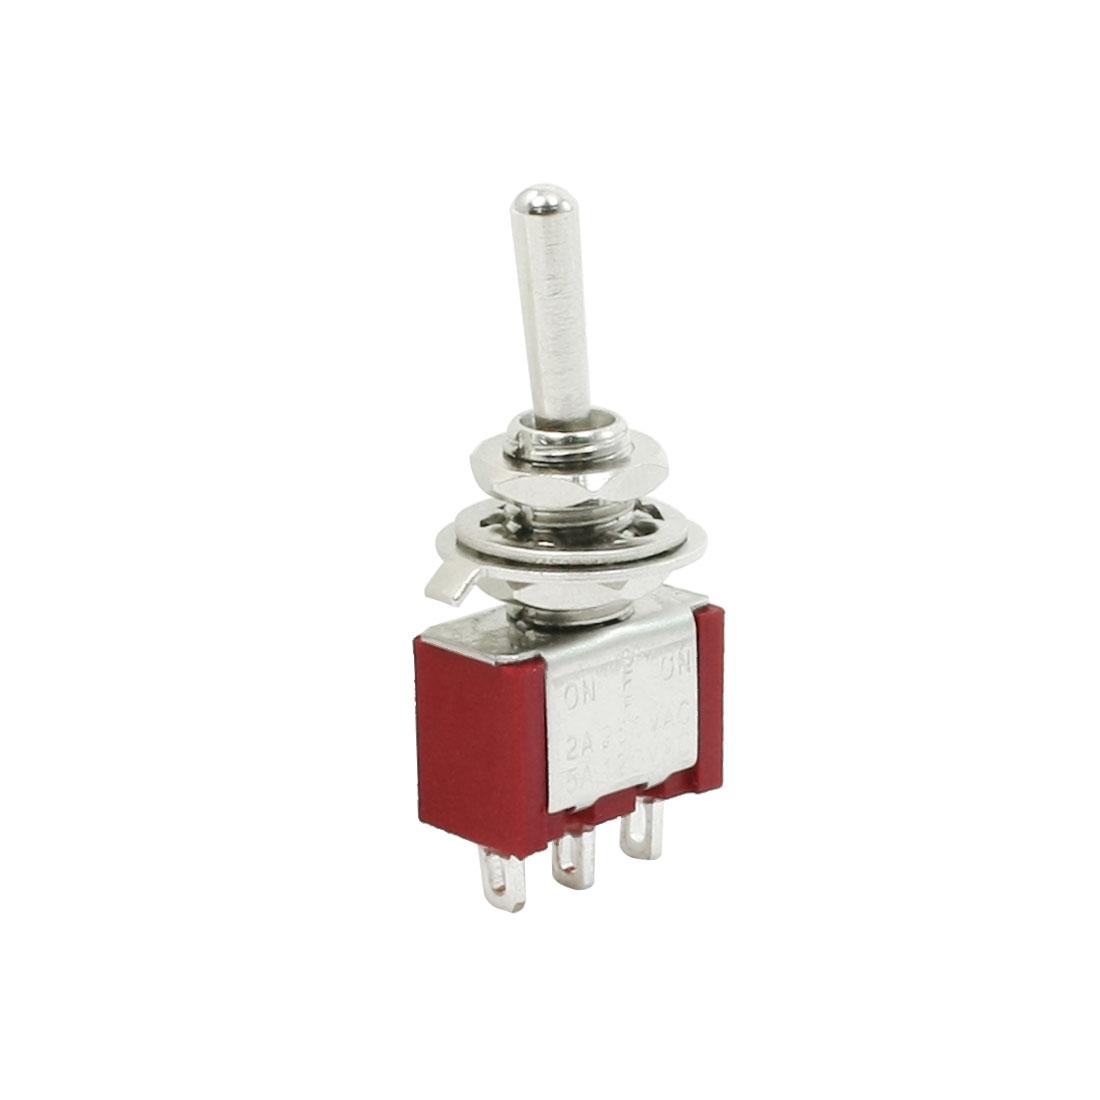 AC 250V/2A 120V/5A SPCO 3 Position ON/Off/ON Toggle Switch